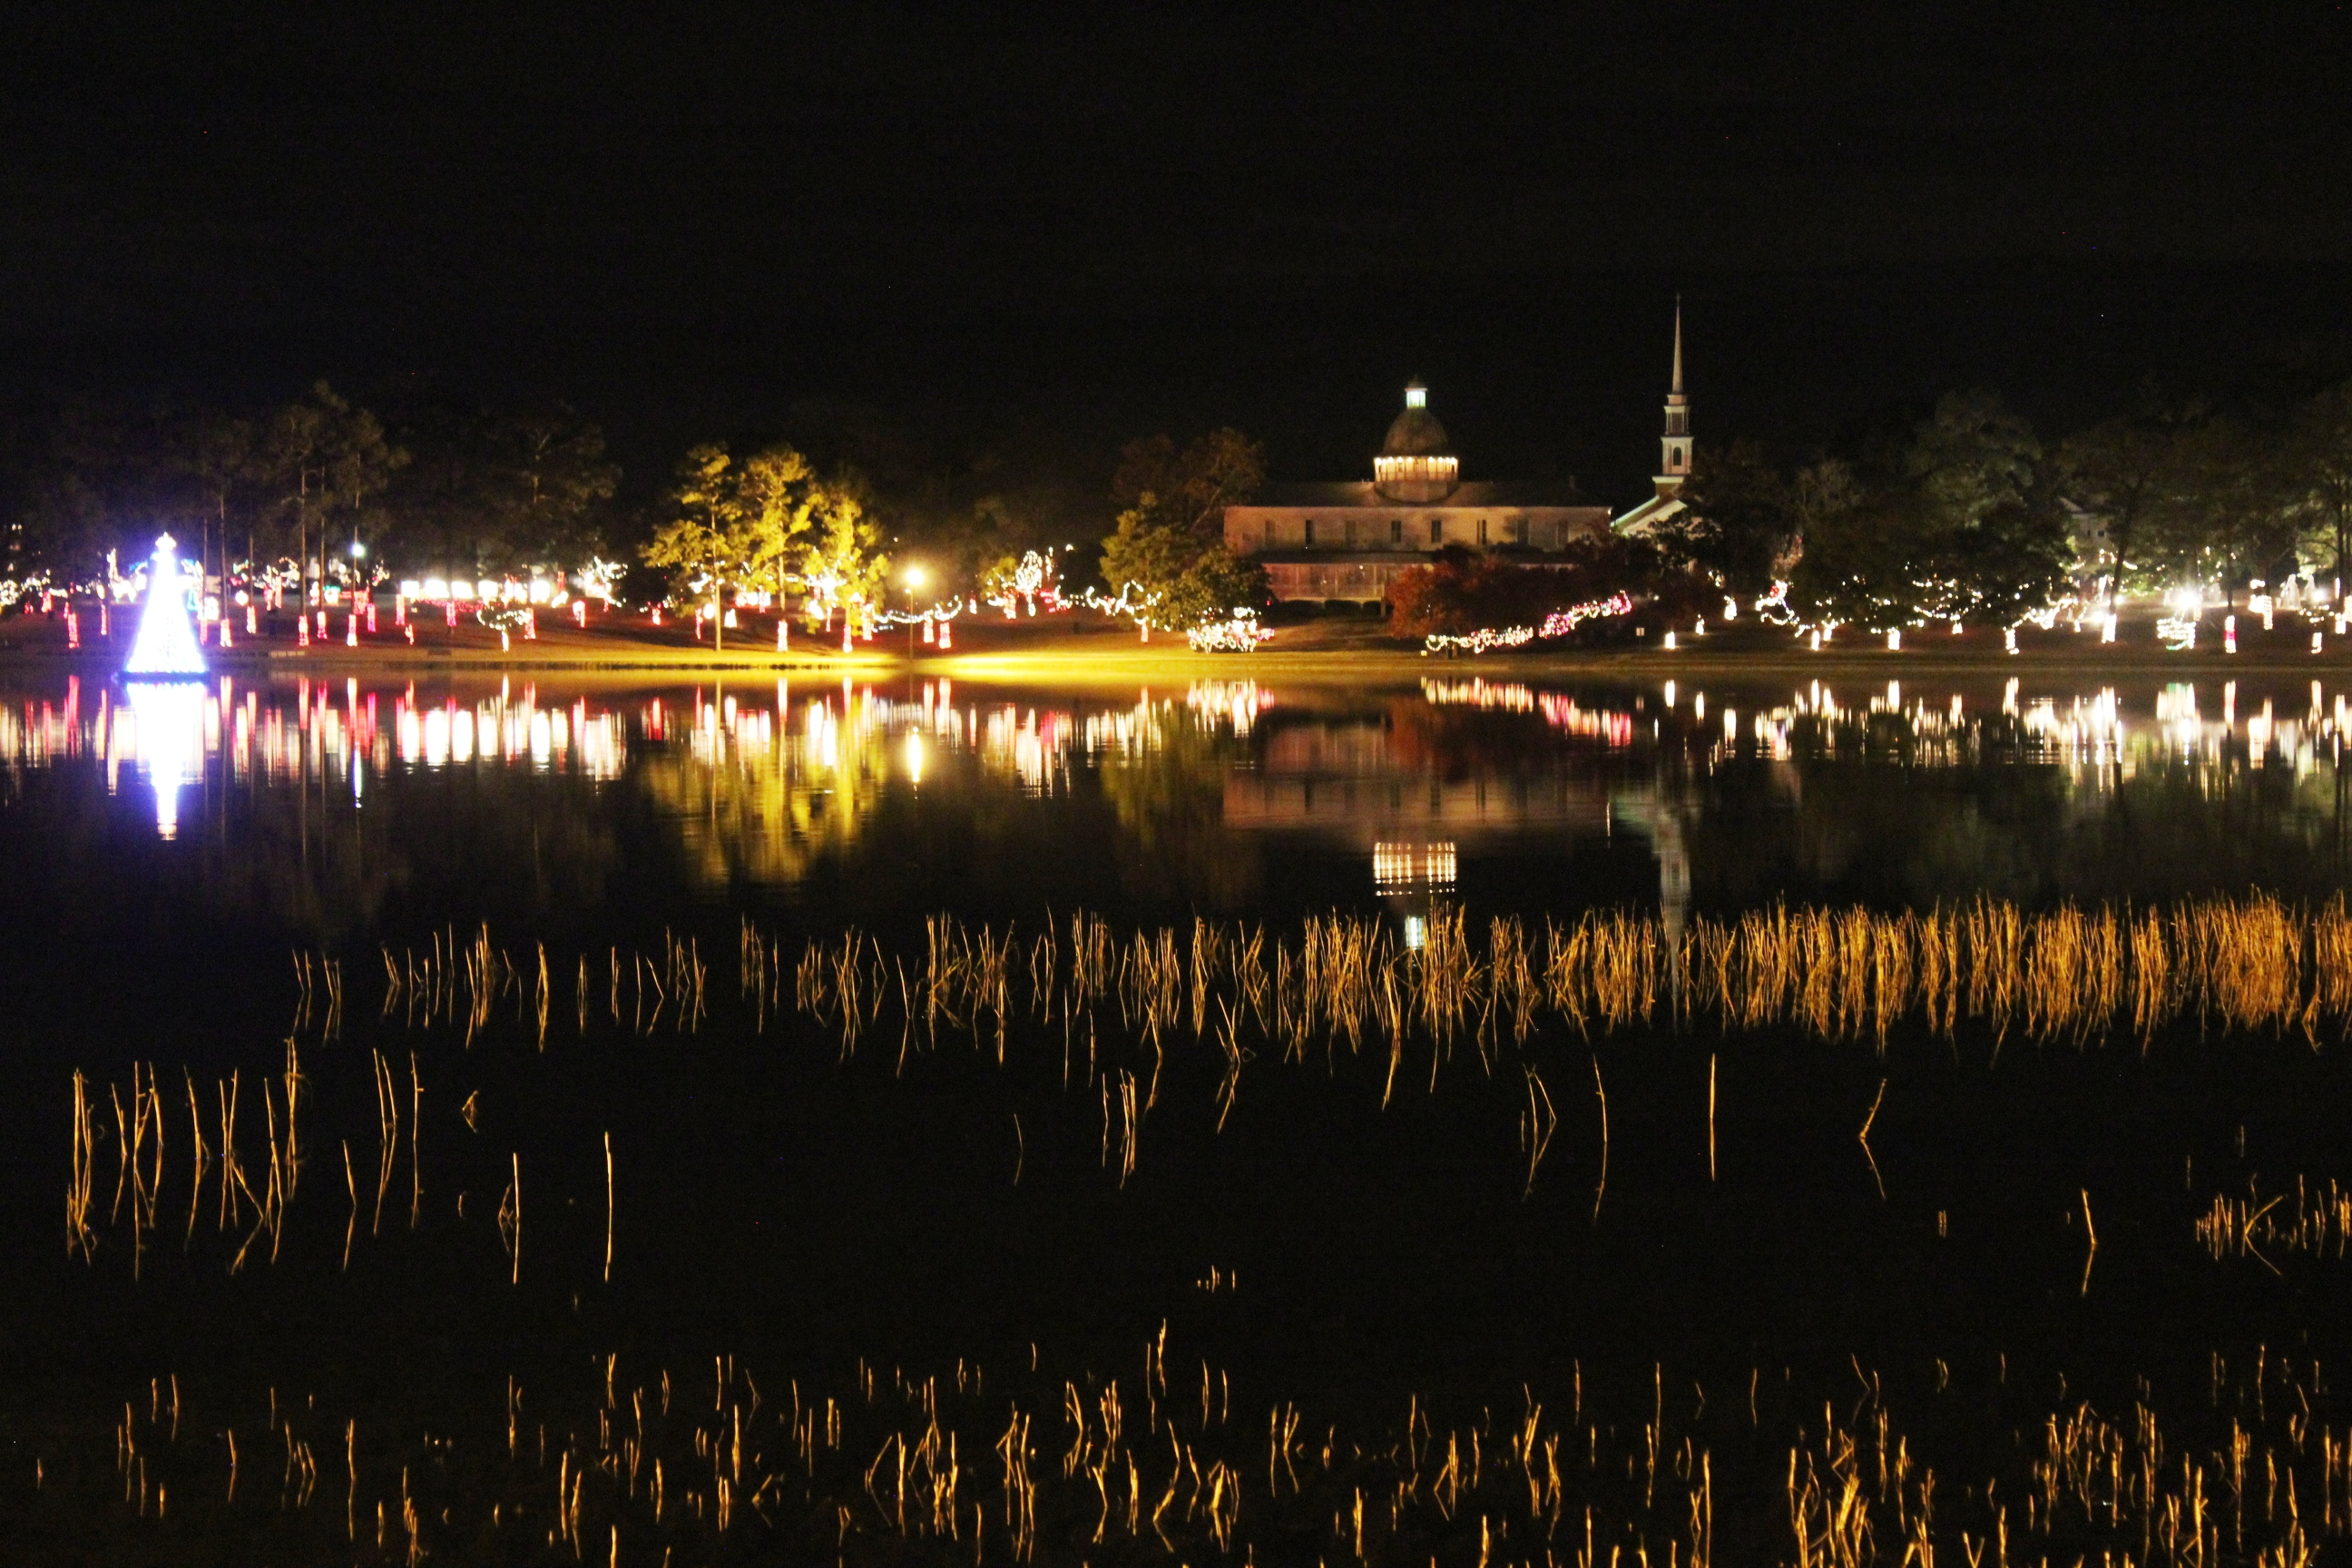 Defuniak Springs Christmas Lights 2020 Millions of Christmas lights on display in DeFuniak Springs